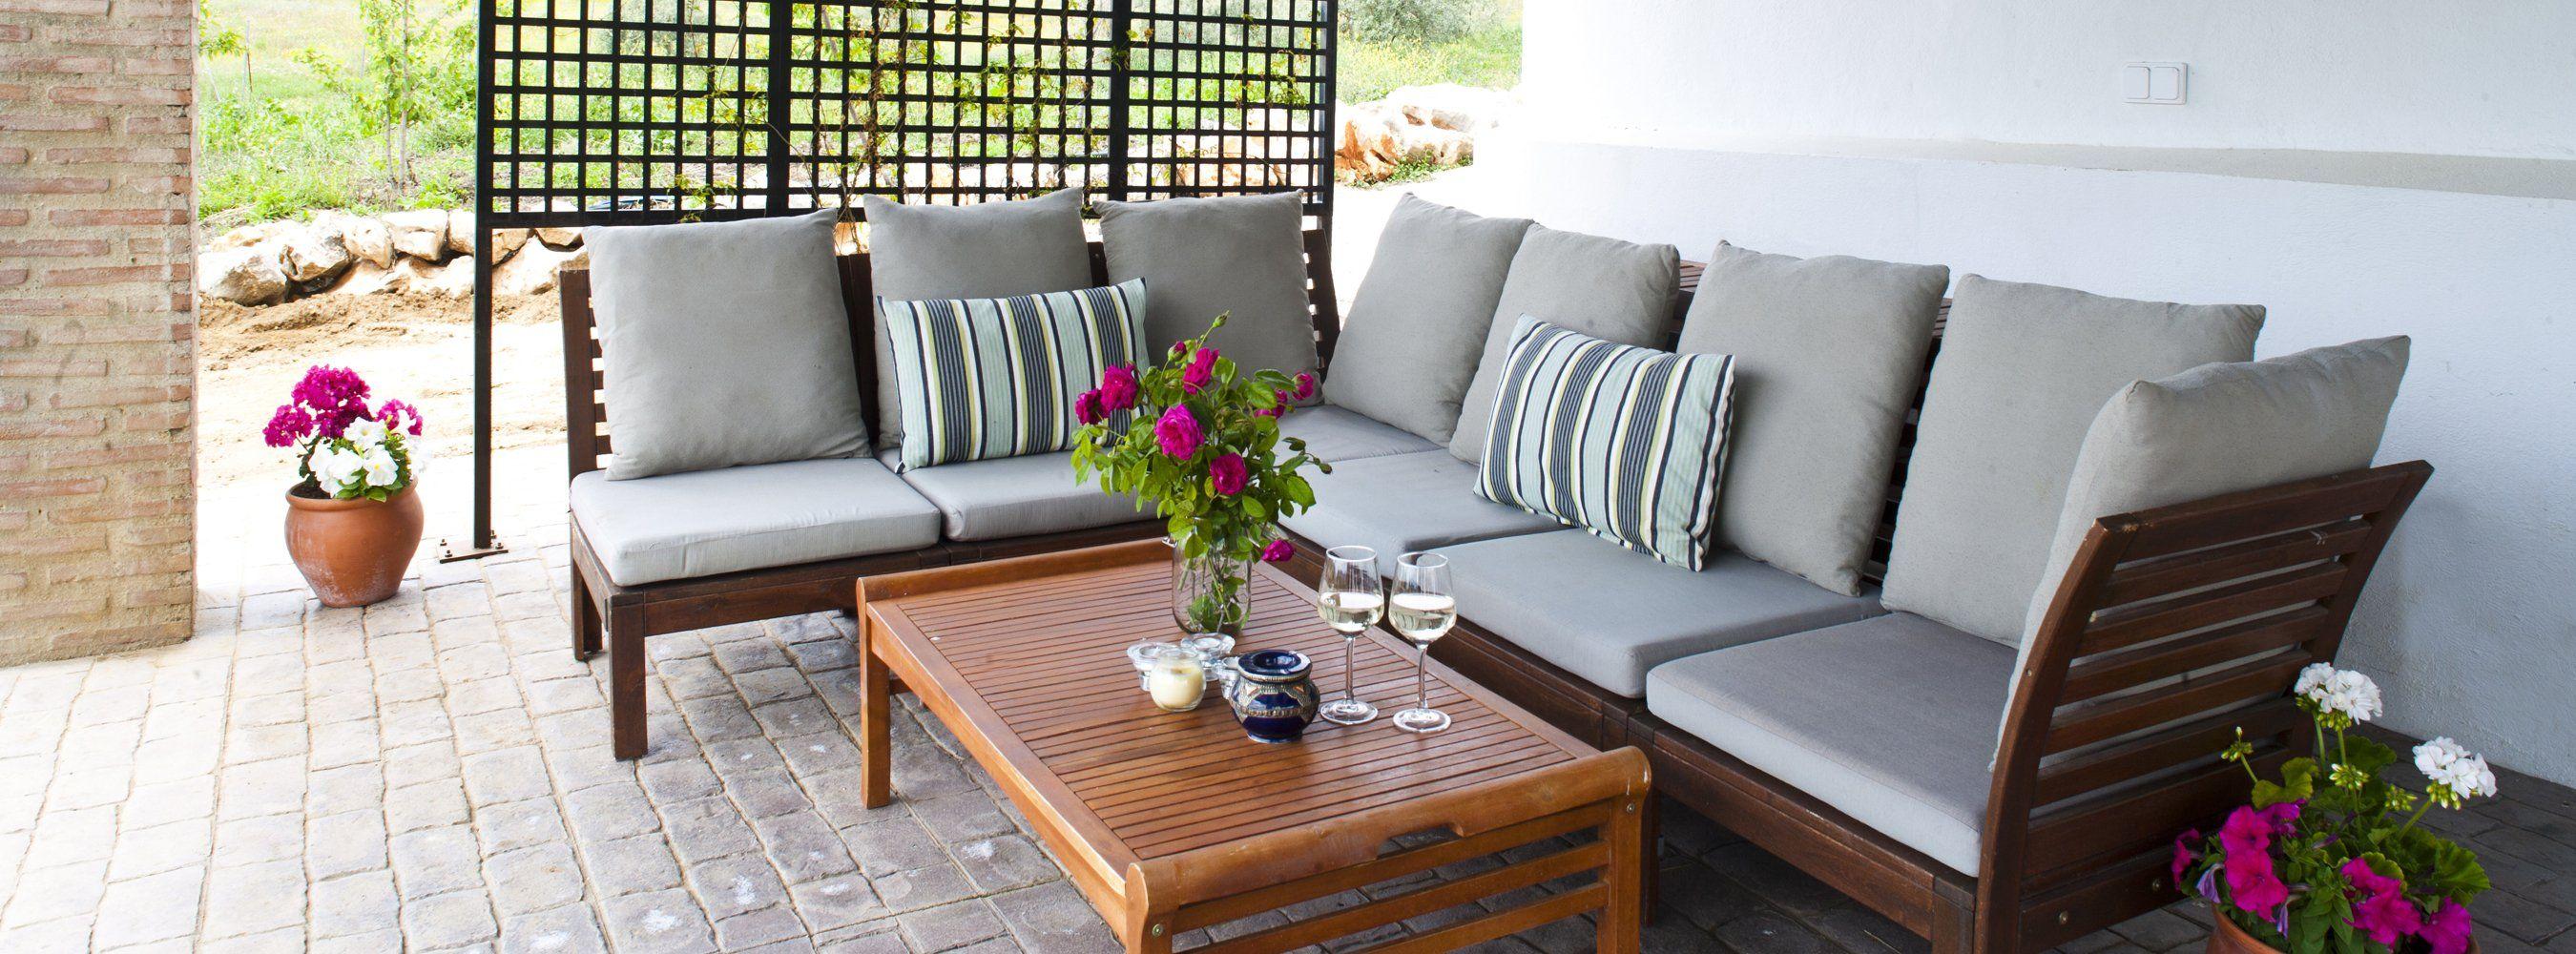 outdoor seating ronda